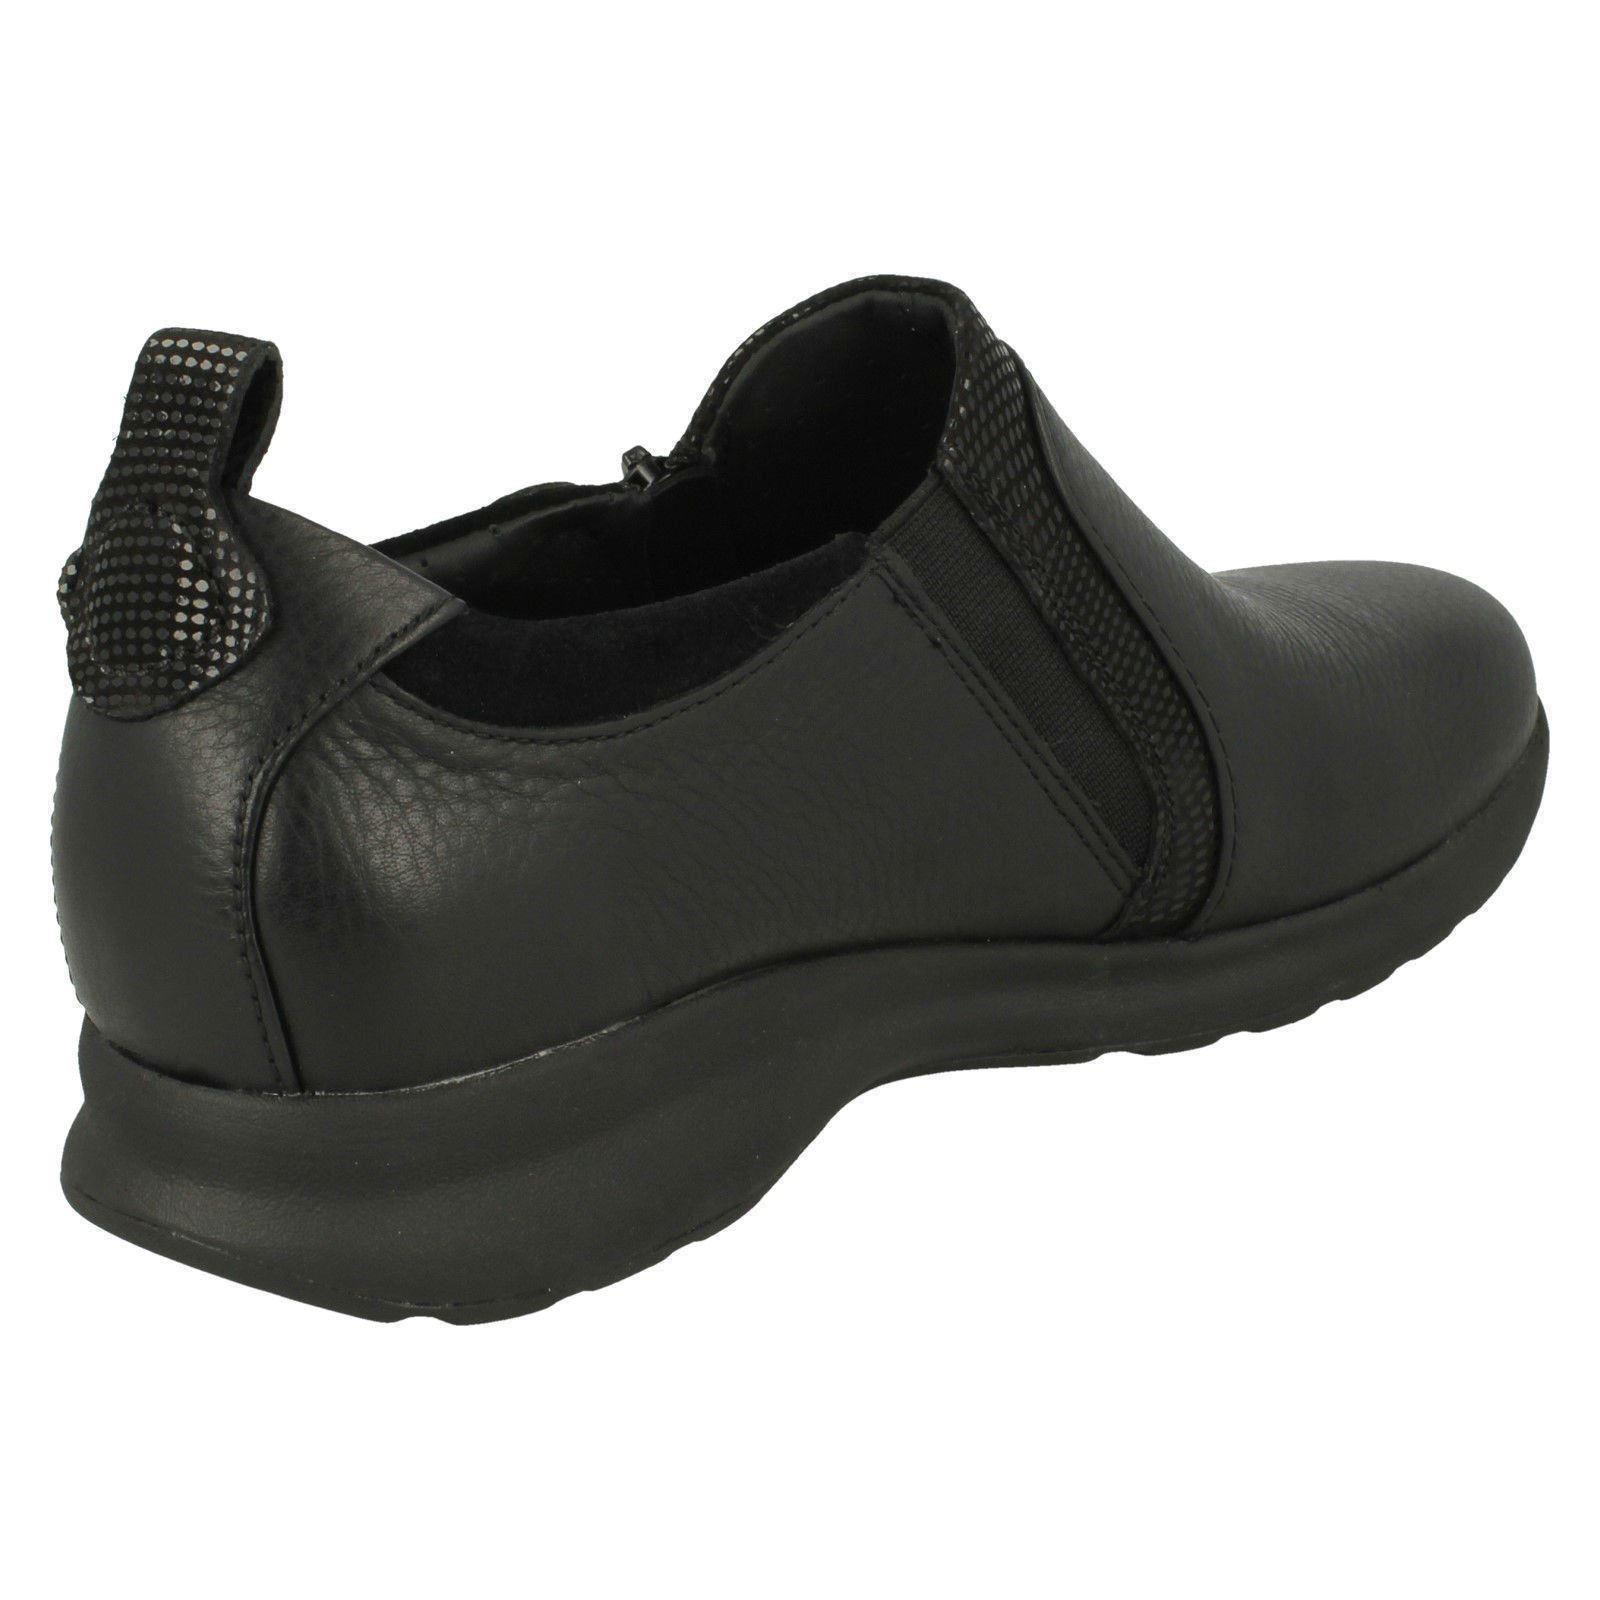 'Ladies Clarks' Clarks' Clarks' Unstructured Slip On shoes - Un Adorn Zip 59217d